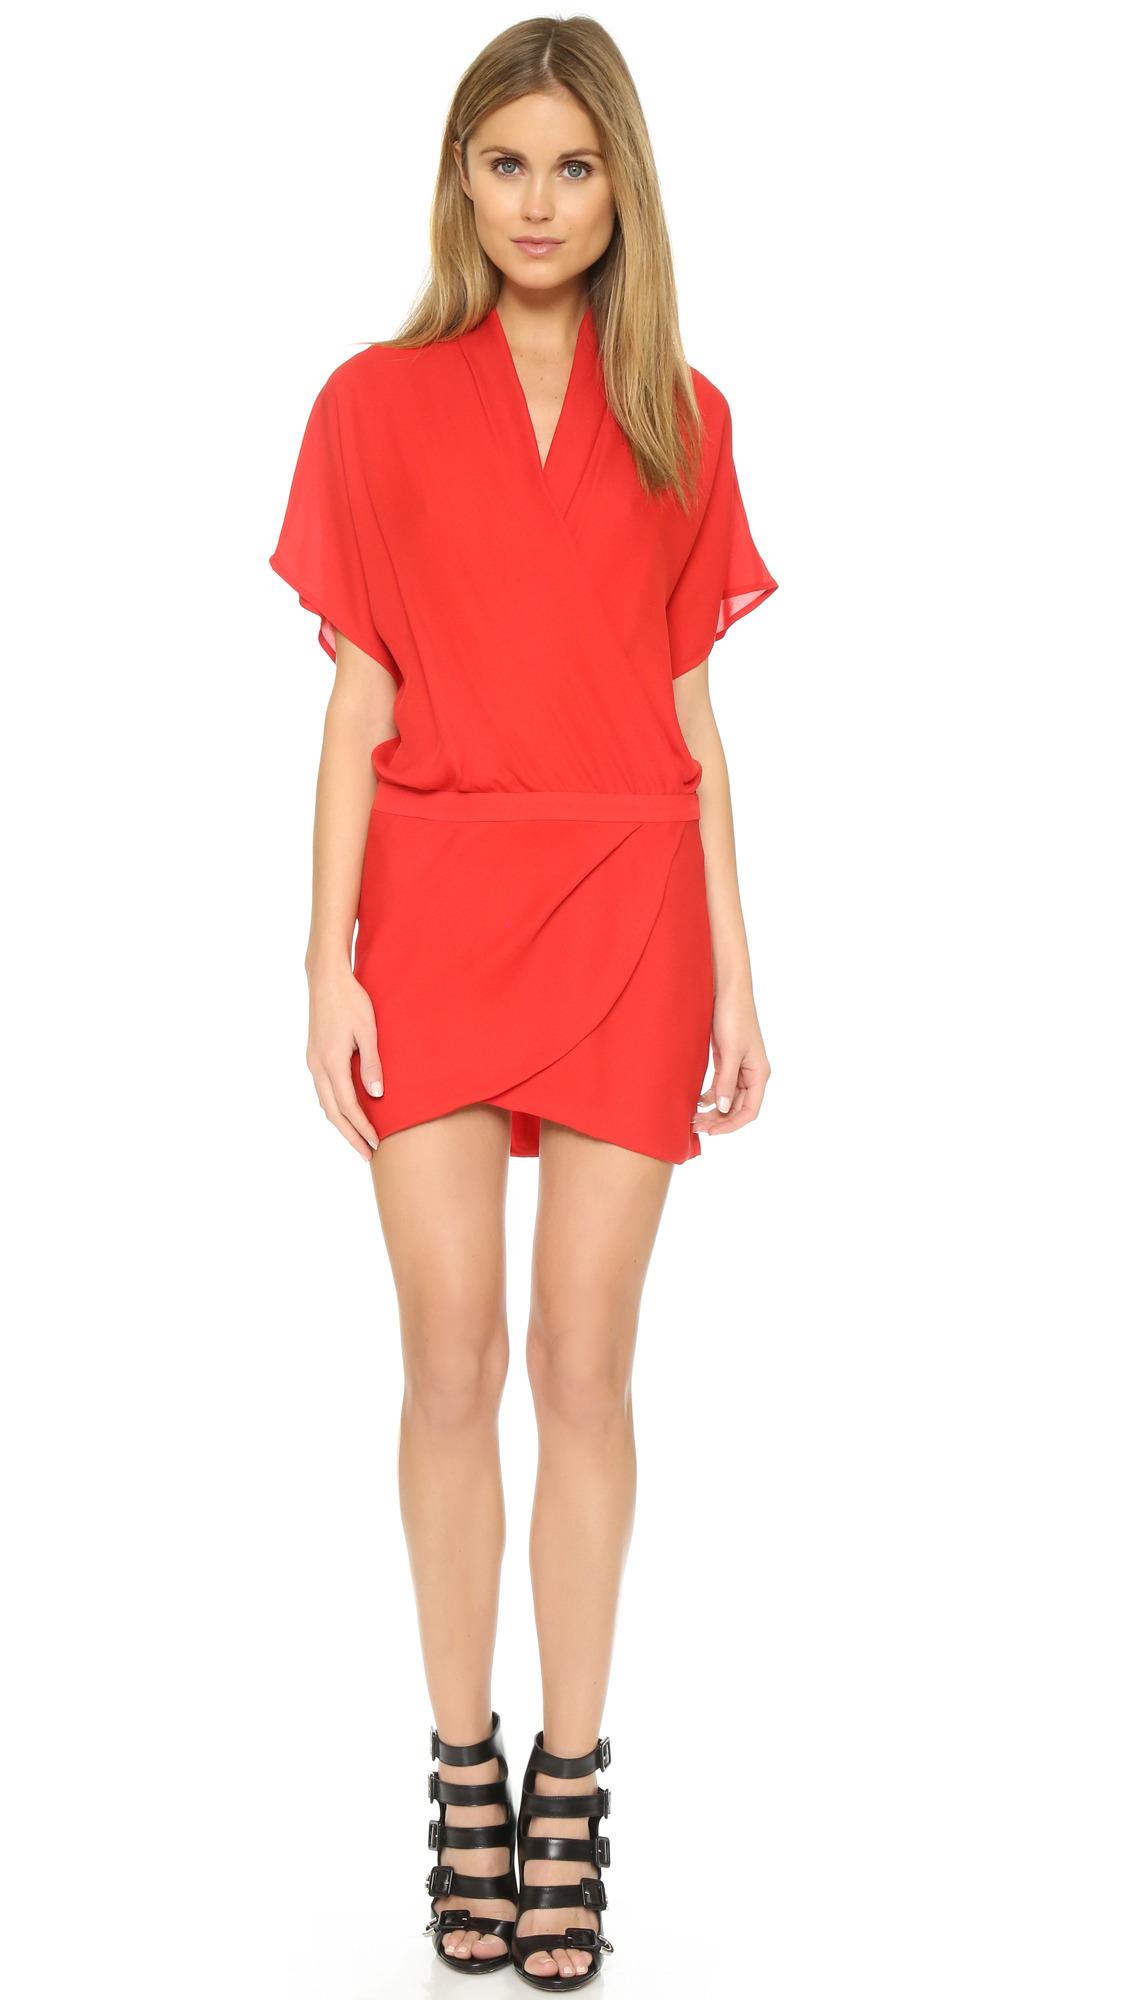 DRESSES - Short dresses Mason's 2018 New Online Real Discount Codes Shopping Online pwKK4